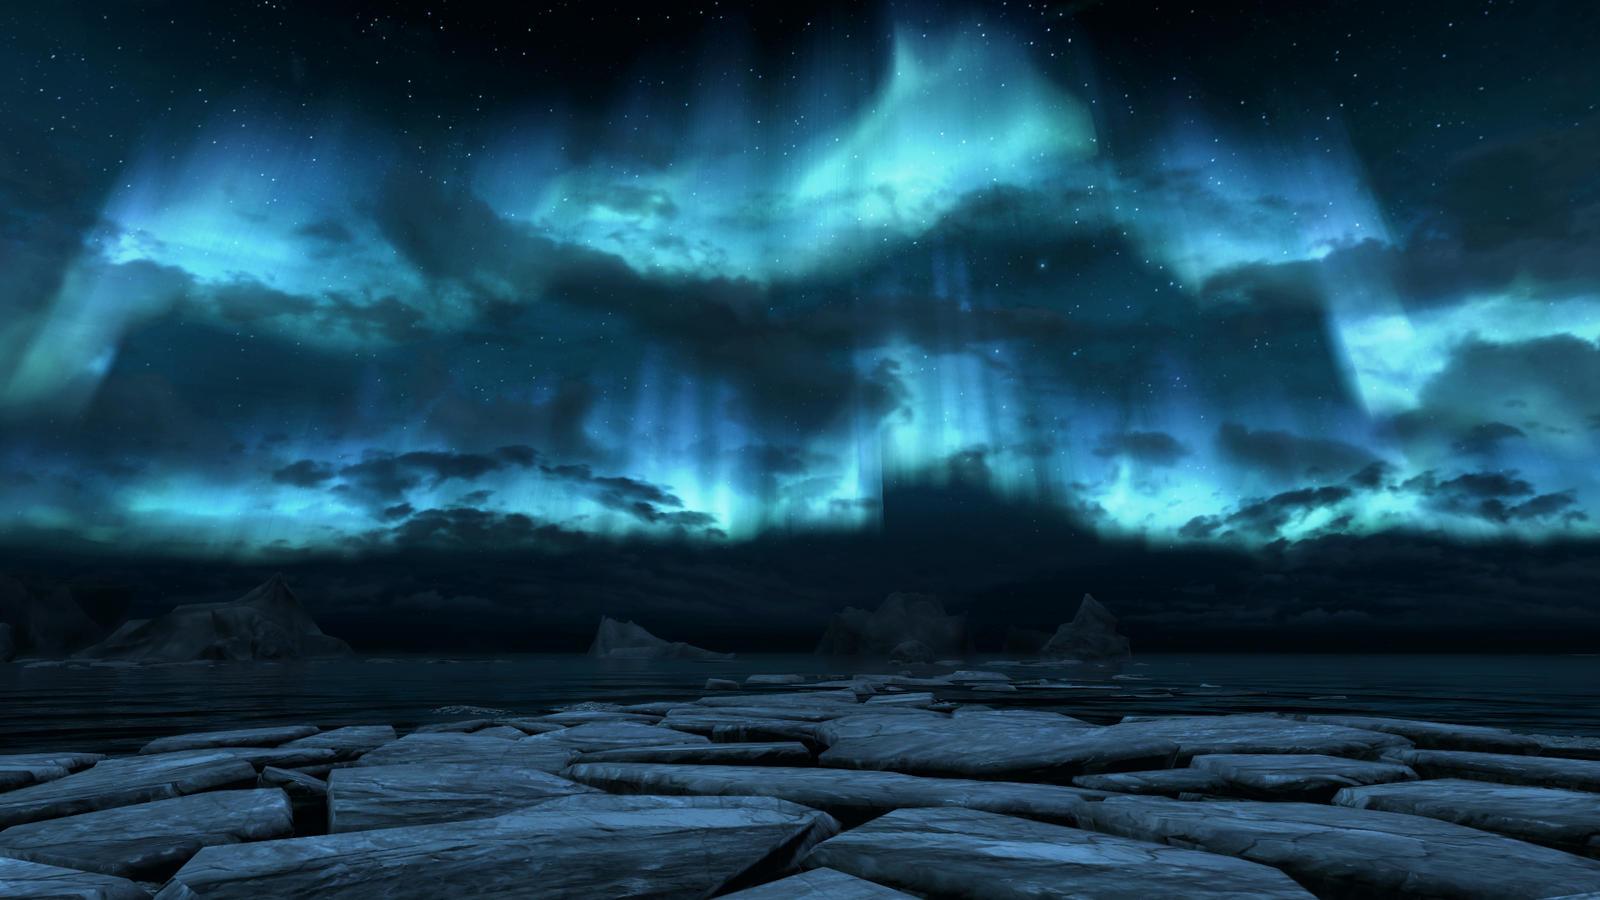 Skryim's Night Sky by DemoraFairy